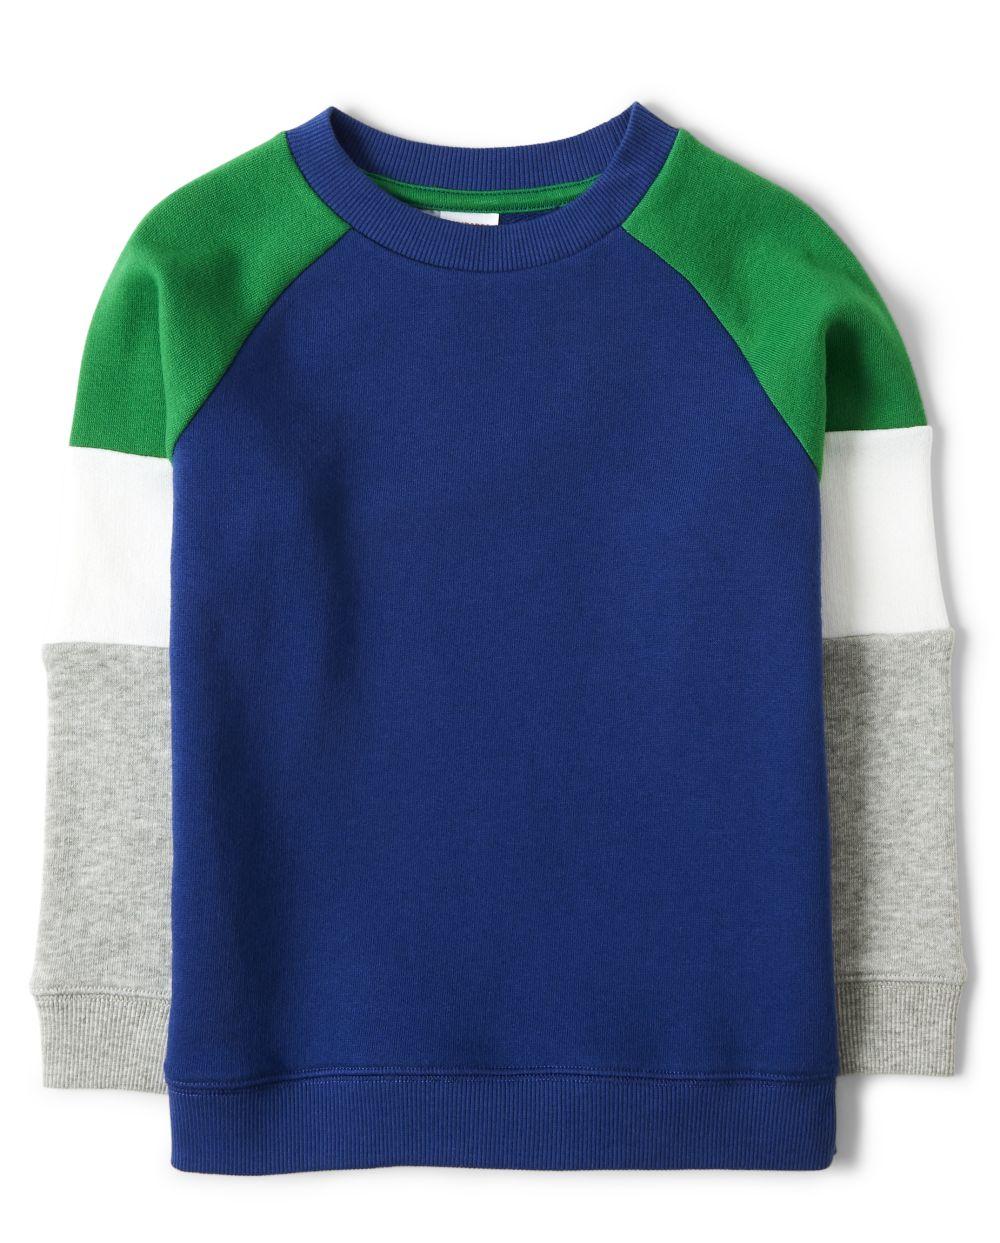 Boys Colorblock Sweatshirt - Dino Roar